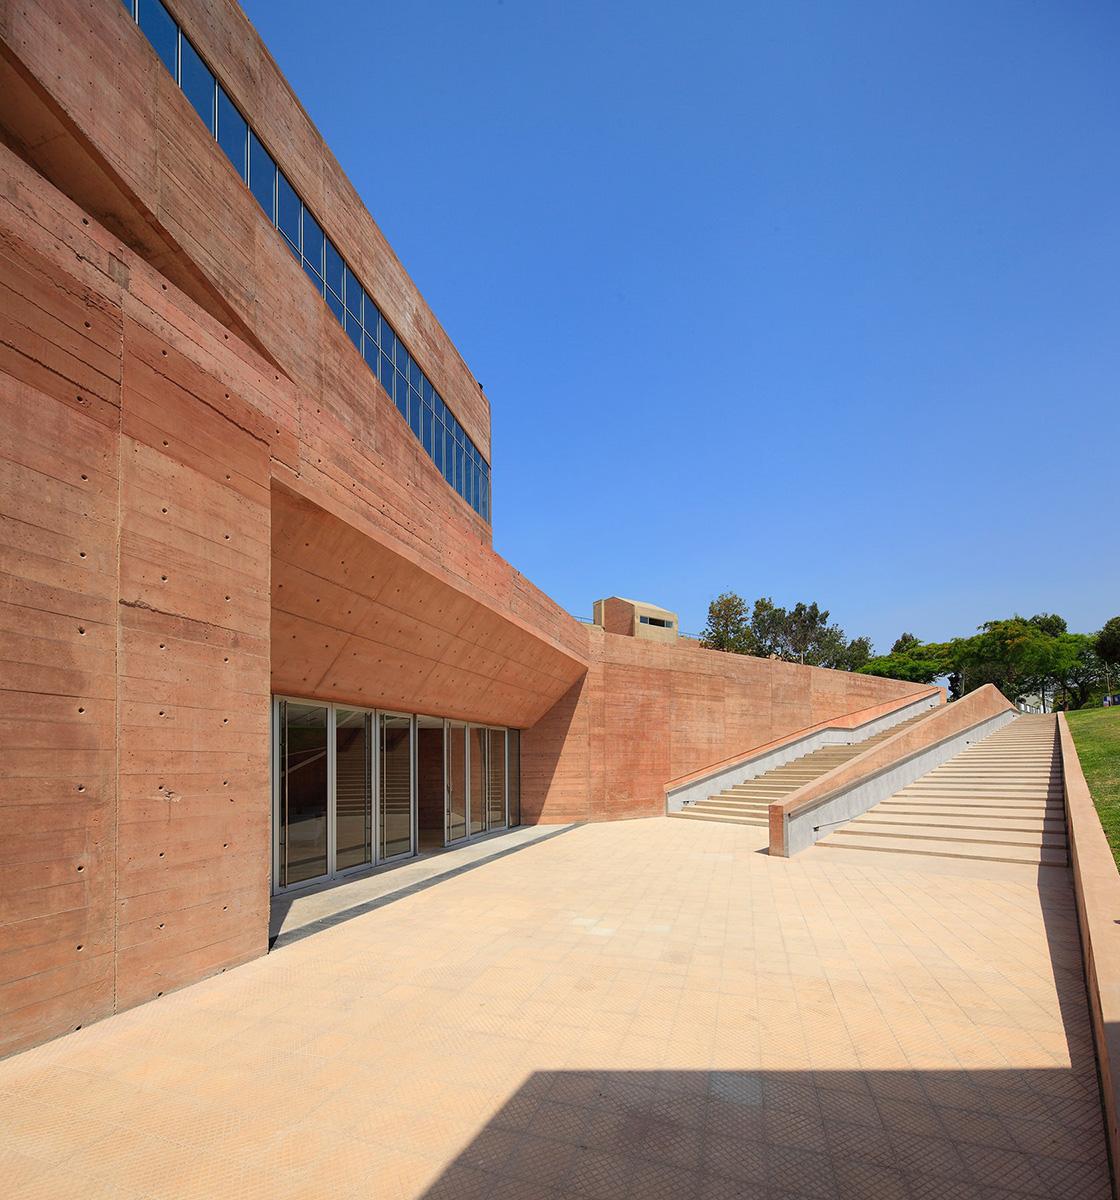 02-biblioteca-ciencias-ingenieria-arquitectura-pucp-foto-juan-solano-ojasi